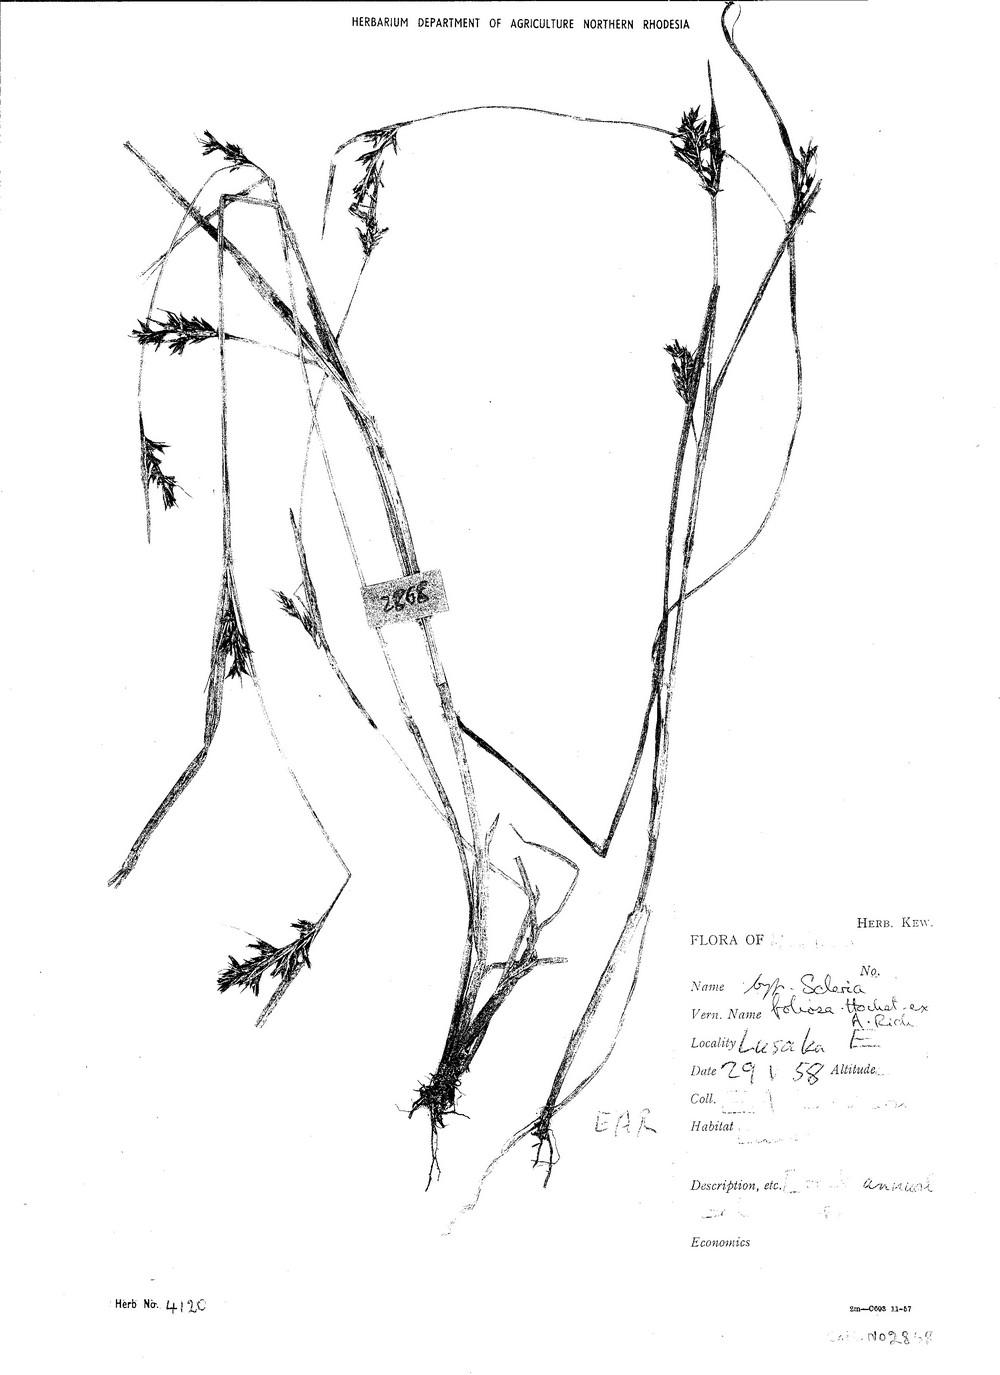 Scleria foliosa